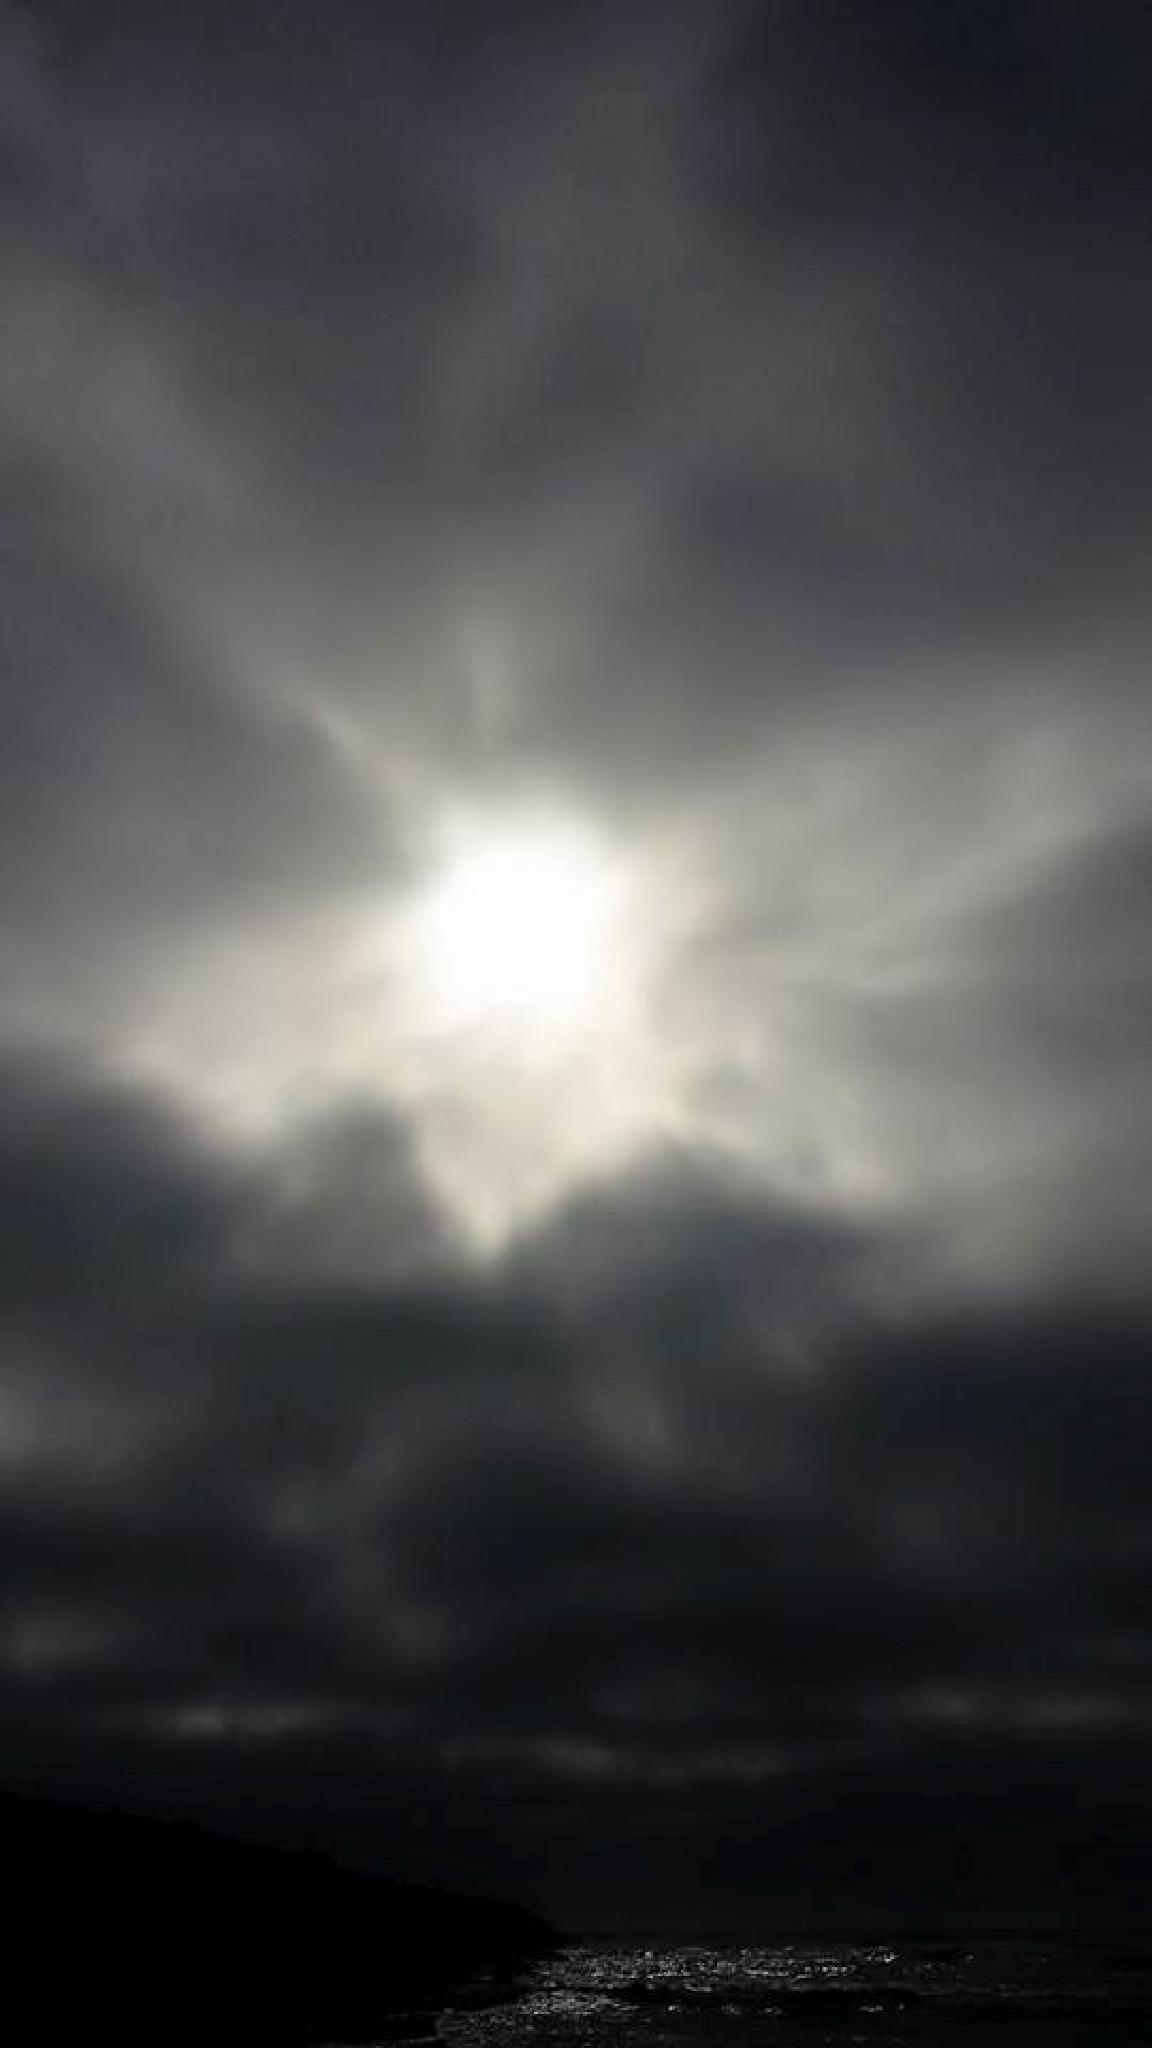 The Night Sky by heylove28